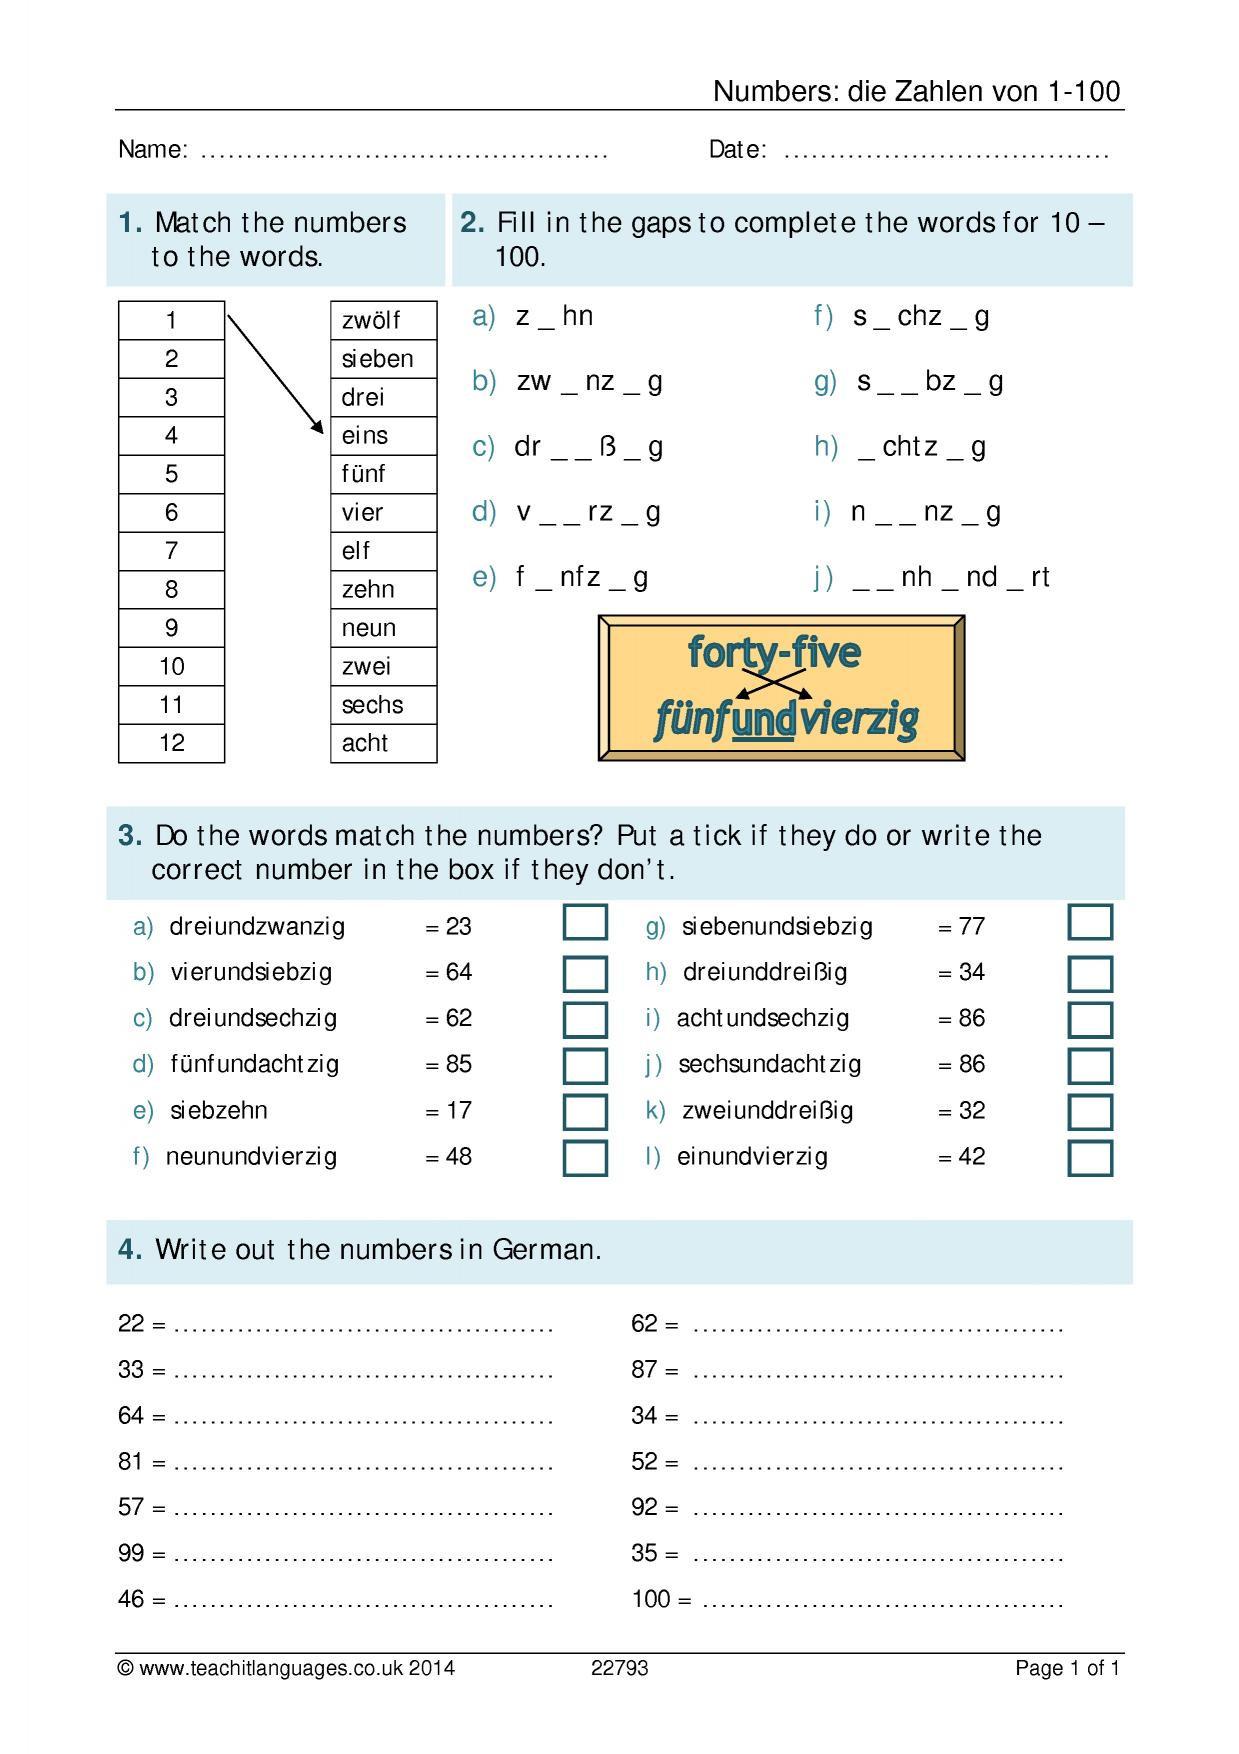 Spanish Numbers Worksheet 1 100 Numbers Zahlen Von 1 100